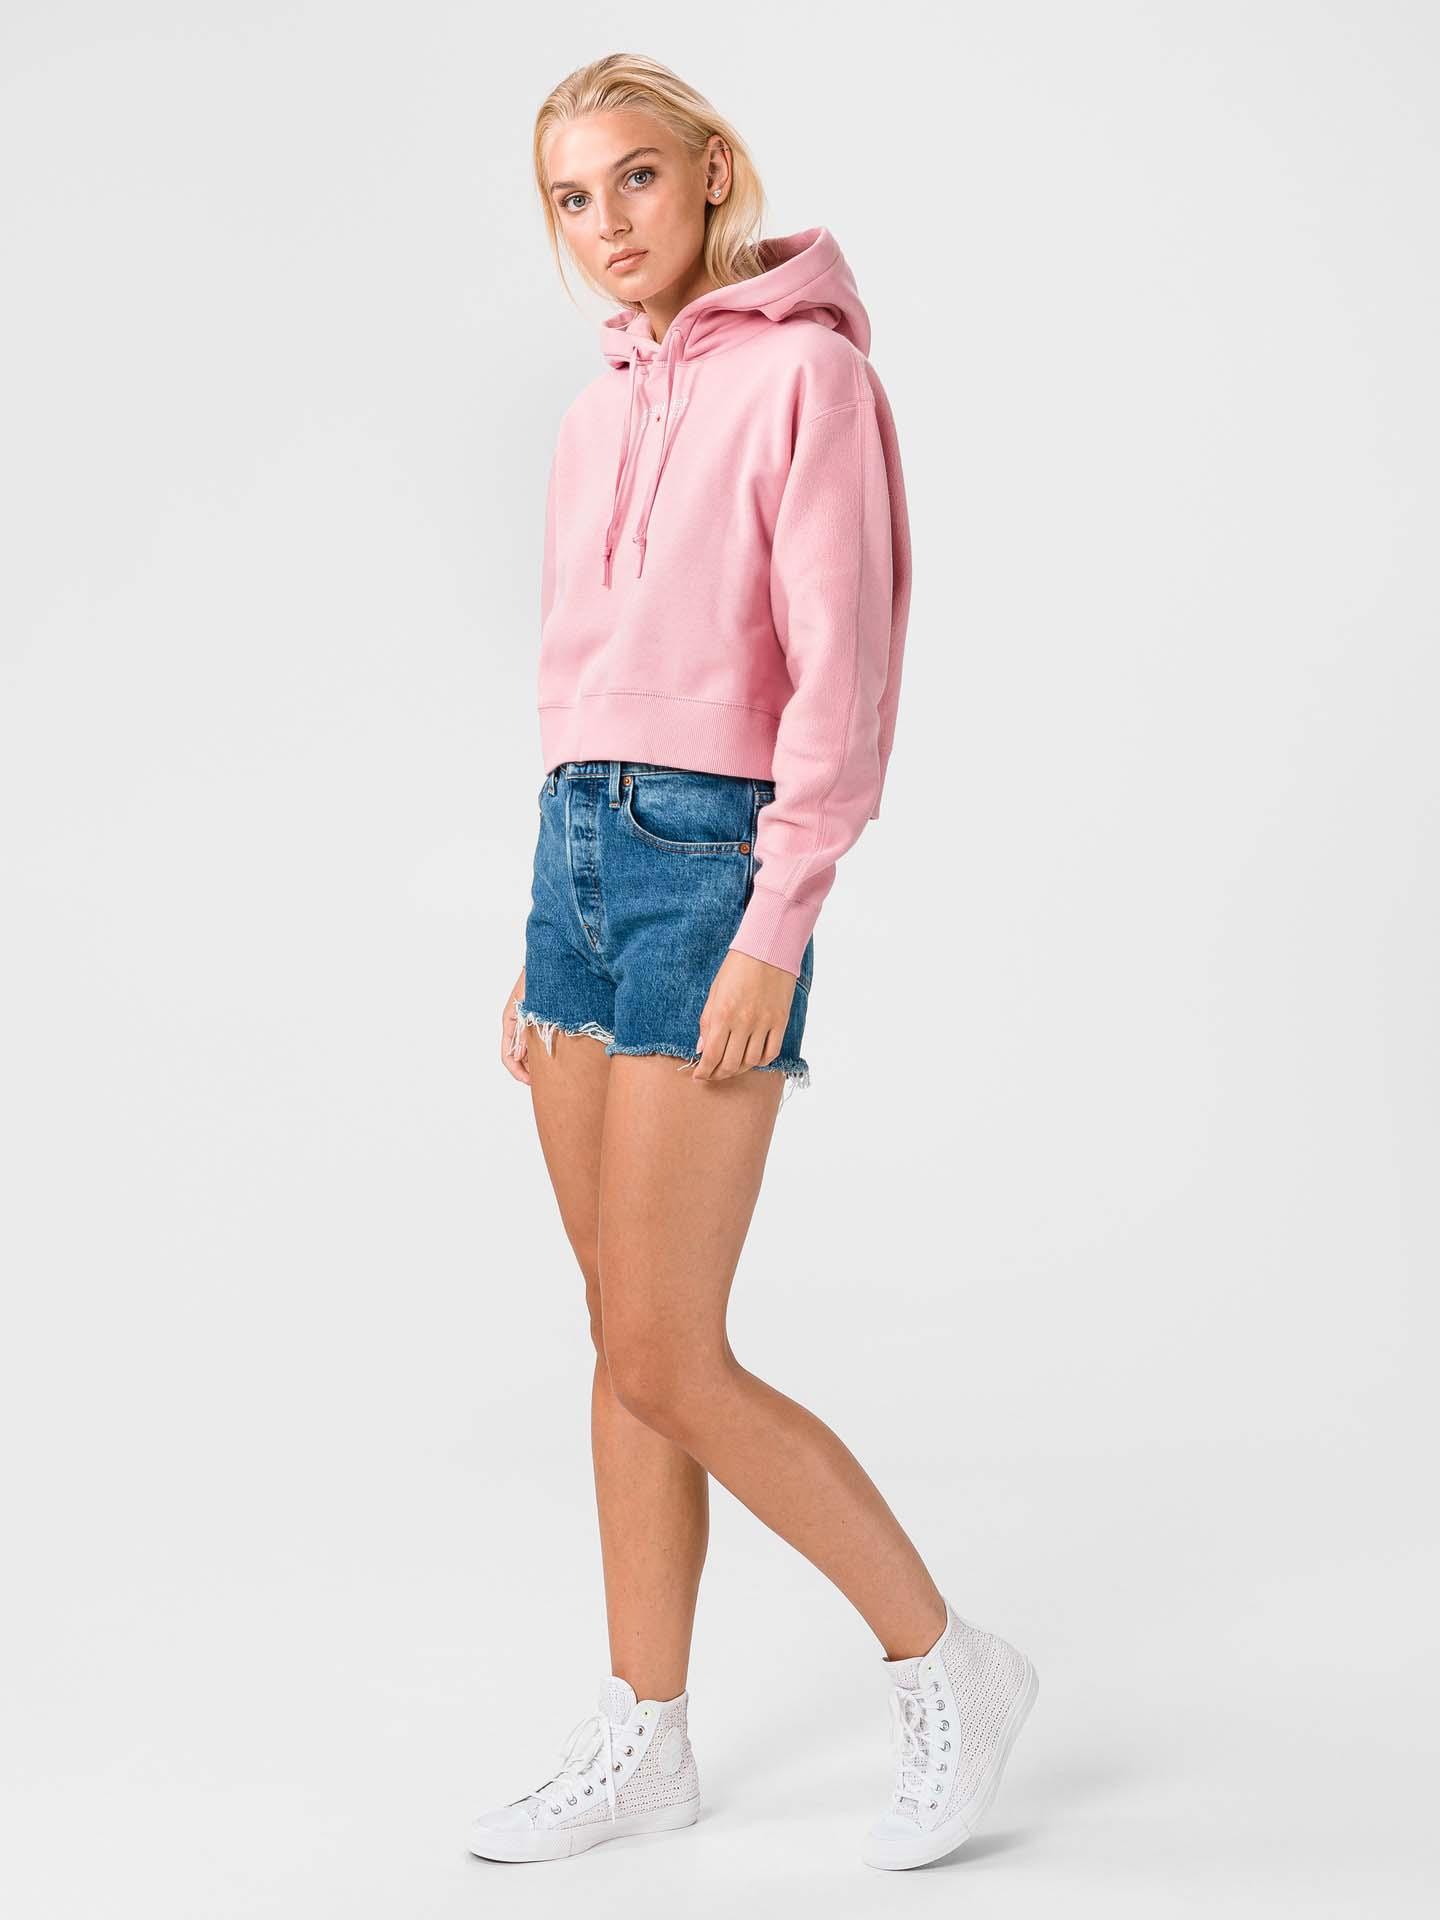 Converse All Star Crop top Pink